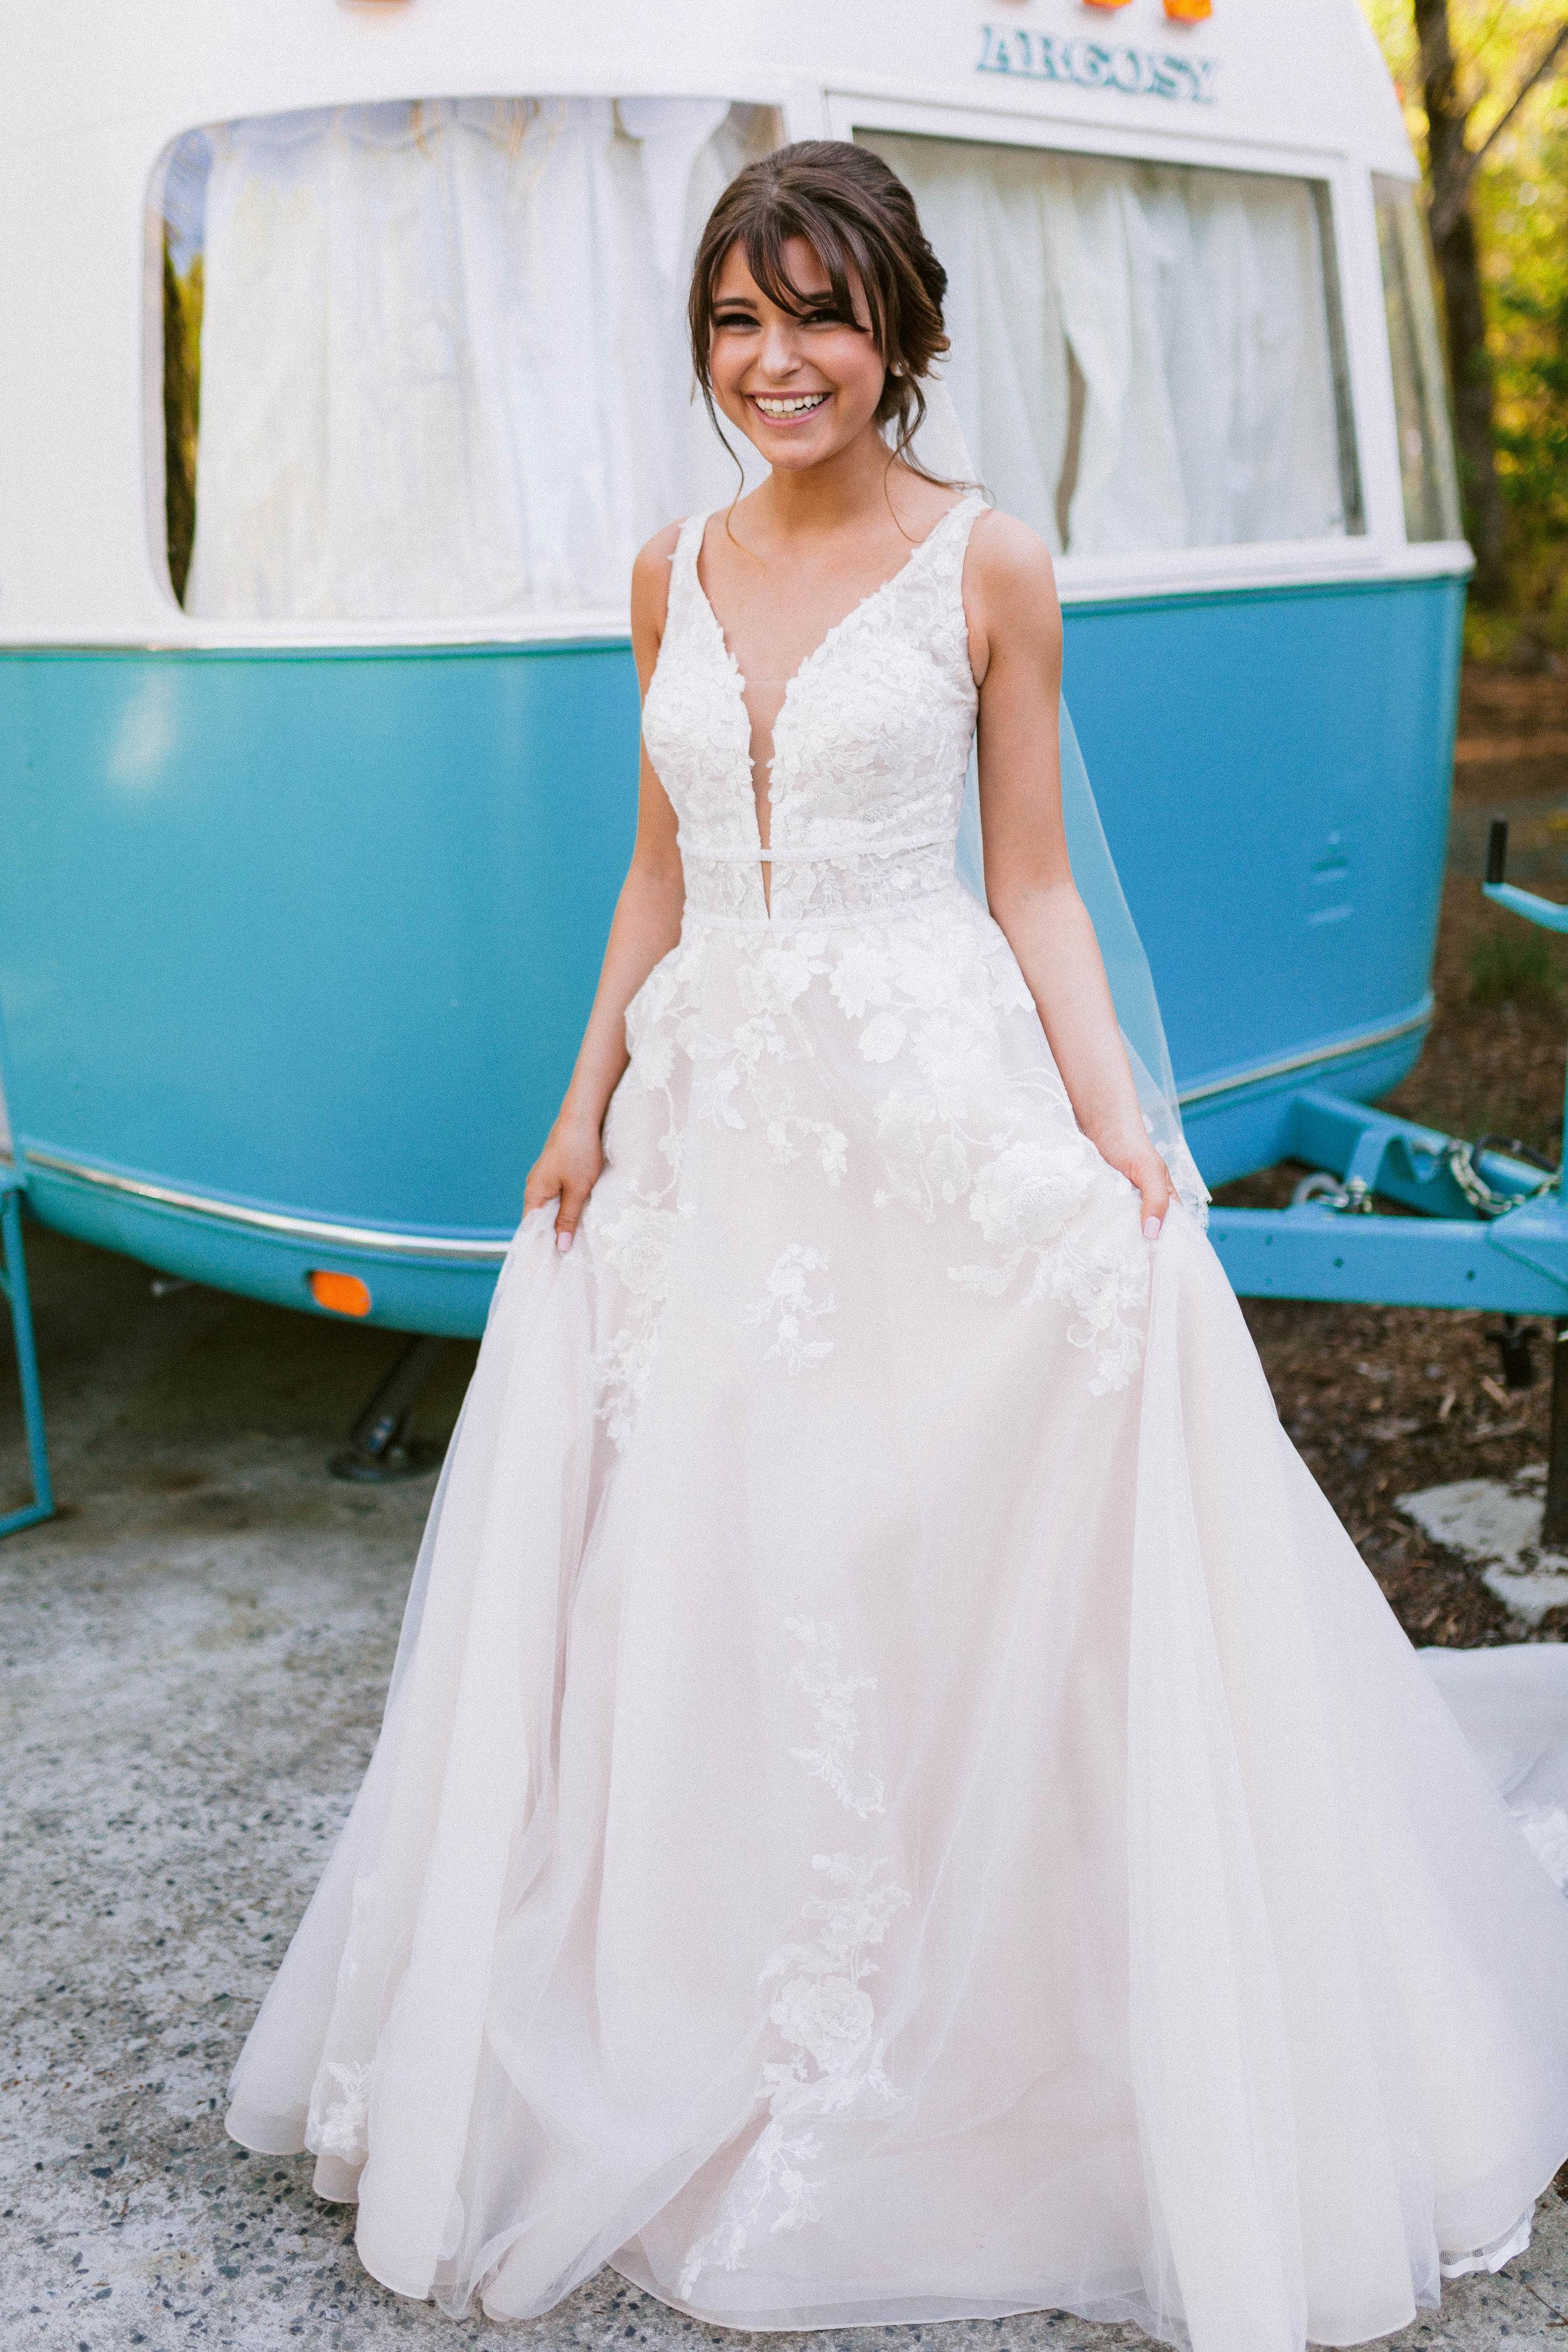 JohannaDyePhotography-chapel-hill-bride-bridesmaids-15.jpg